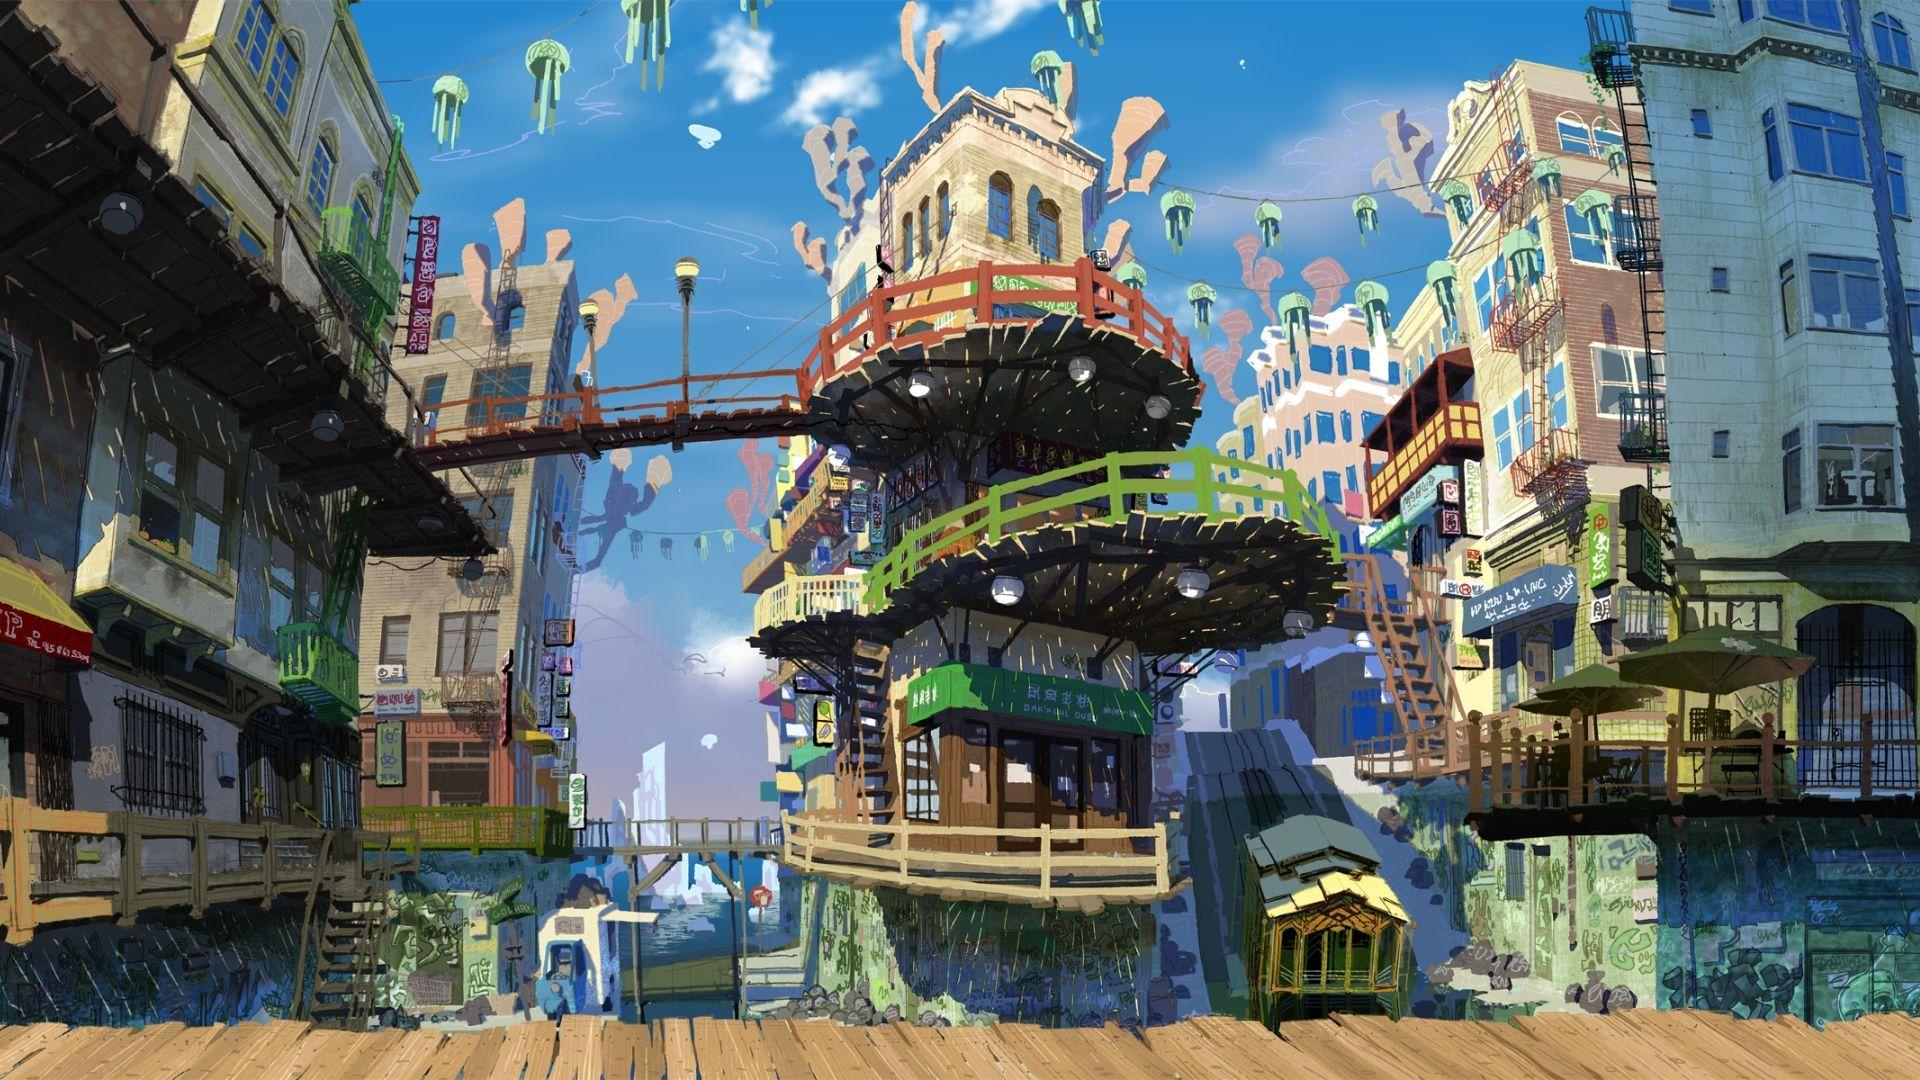 1920x1080 Anime City Hd Wallpaper 1920x1080 Id 22284 Wallpapervortex Com Anime Scenery Wallpaper Scenery Wallpaper Anime Scenery